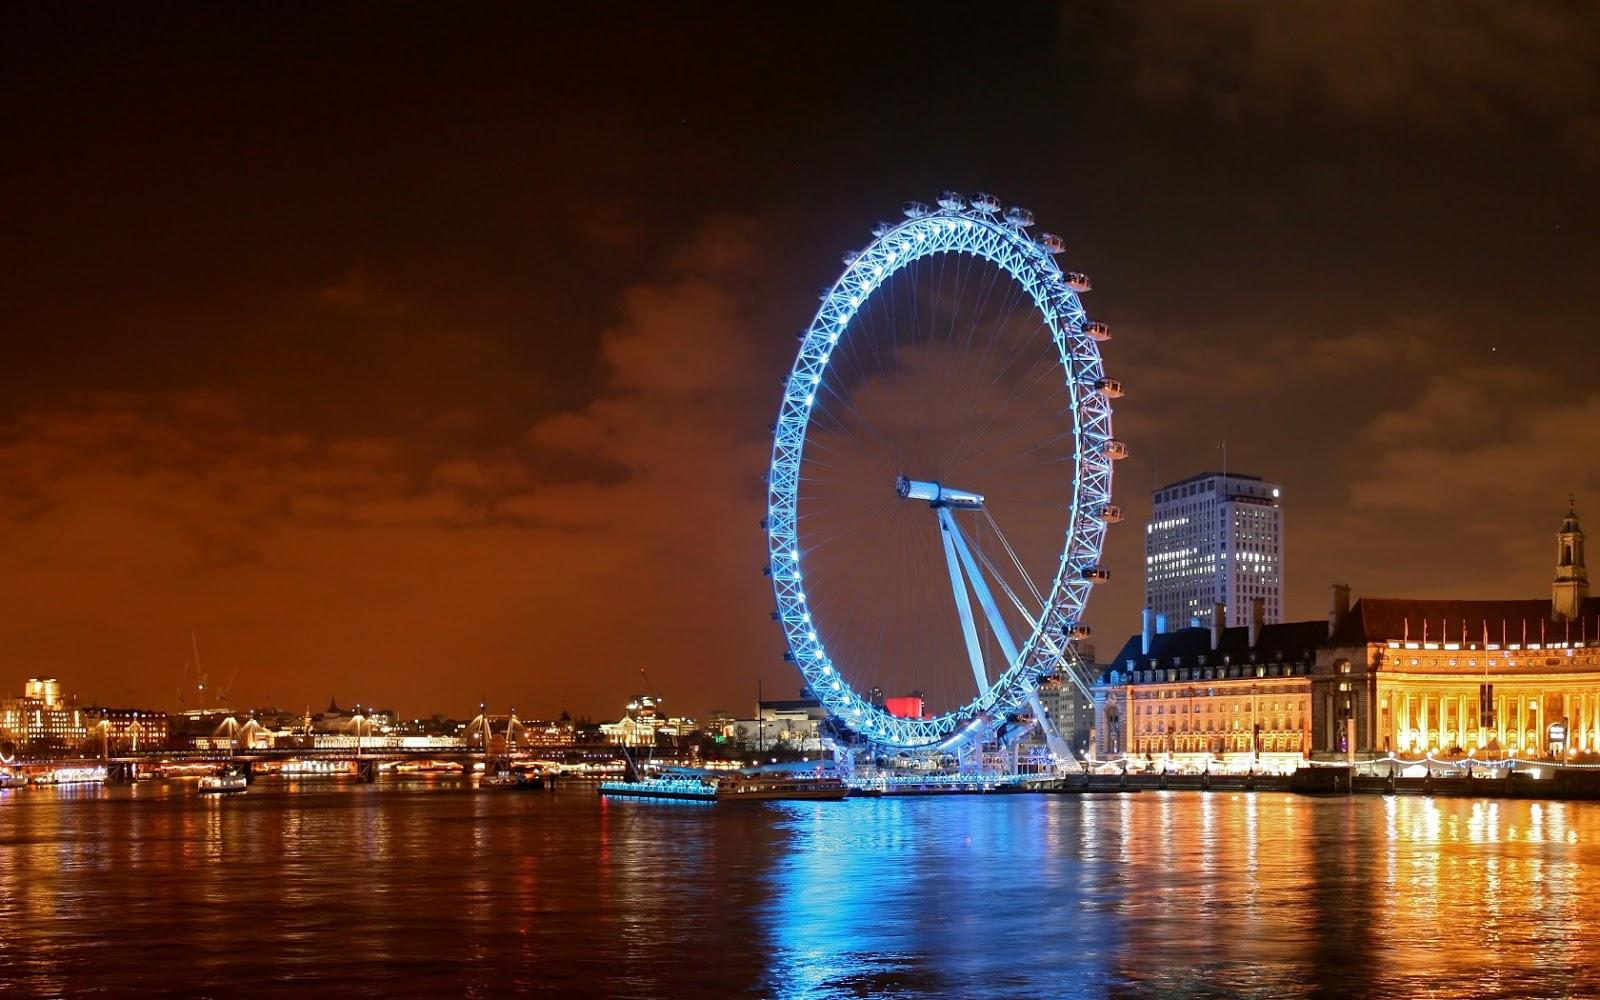 london high resolution - photo #6